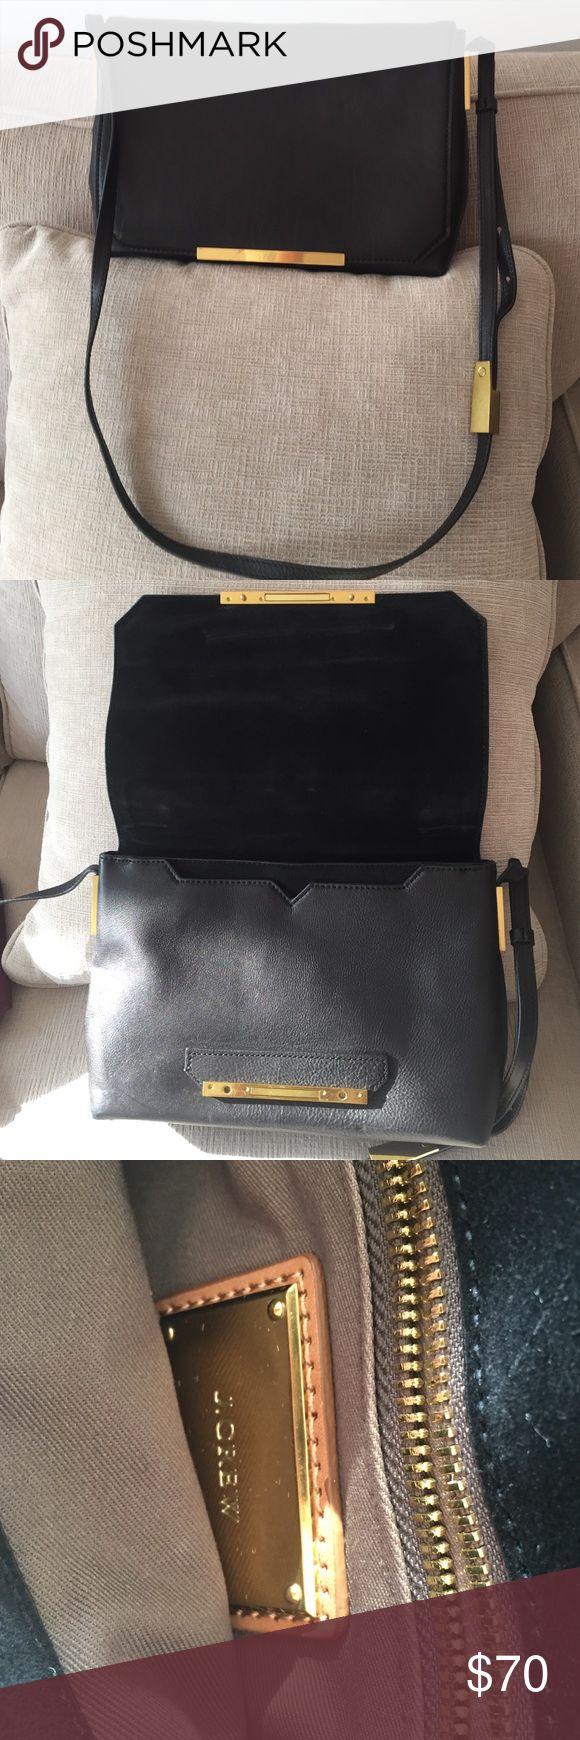 J Crew leather messenger bag, medium size, black Like new J. Crew Bags